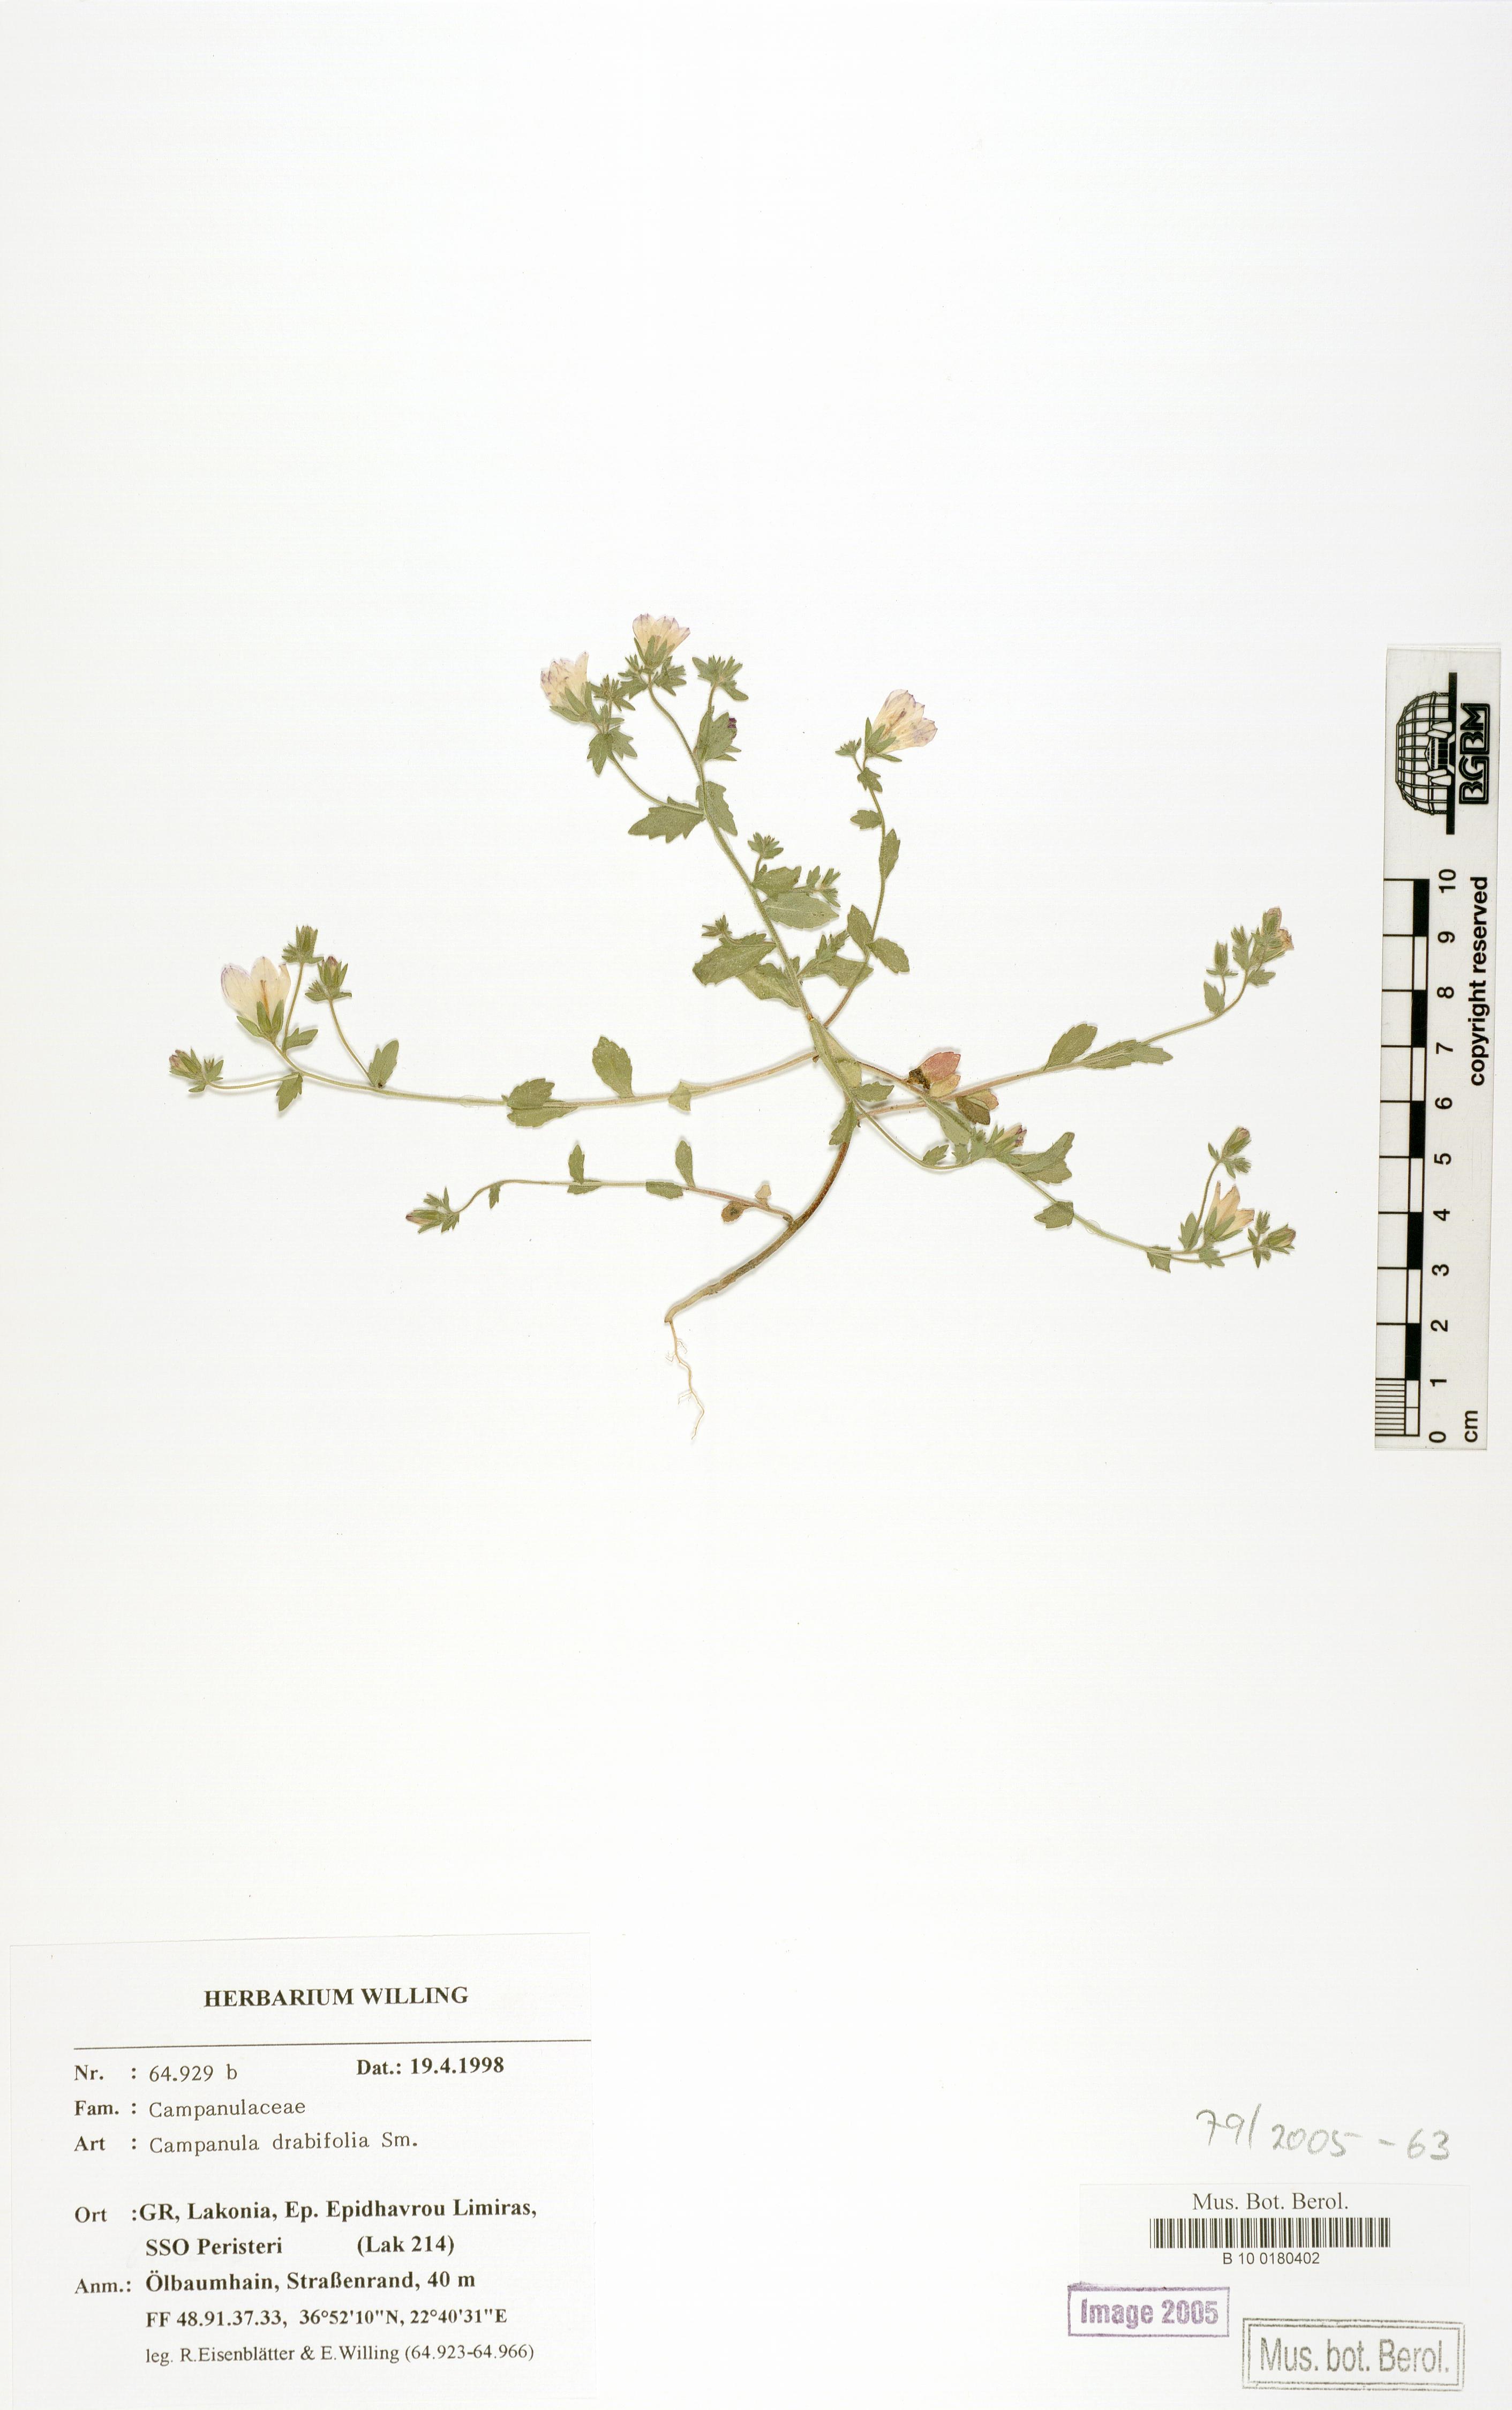 http://ww2.bgbm.org/herbarium/images/B/10/01/80/40/B_10_0180402.jpg